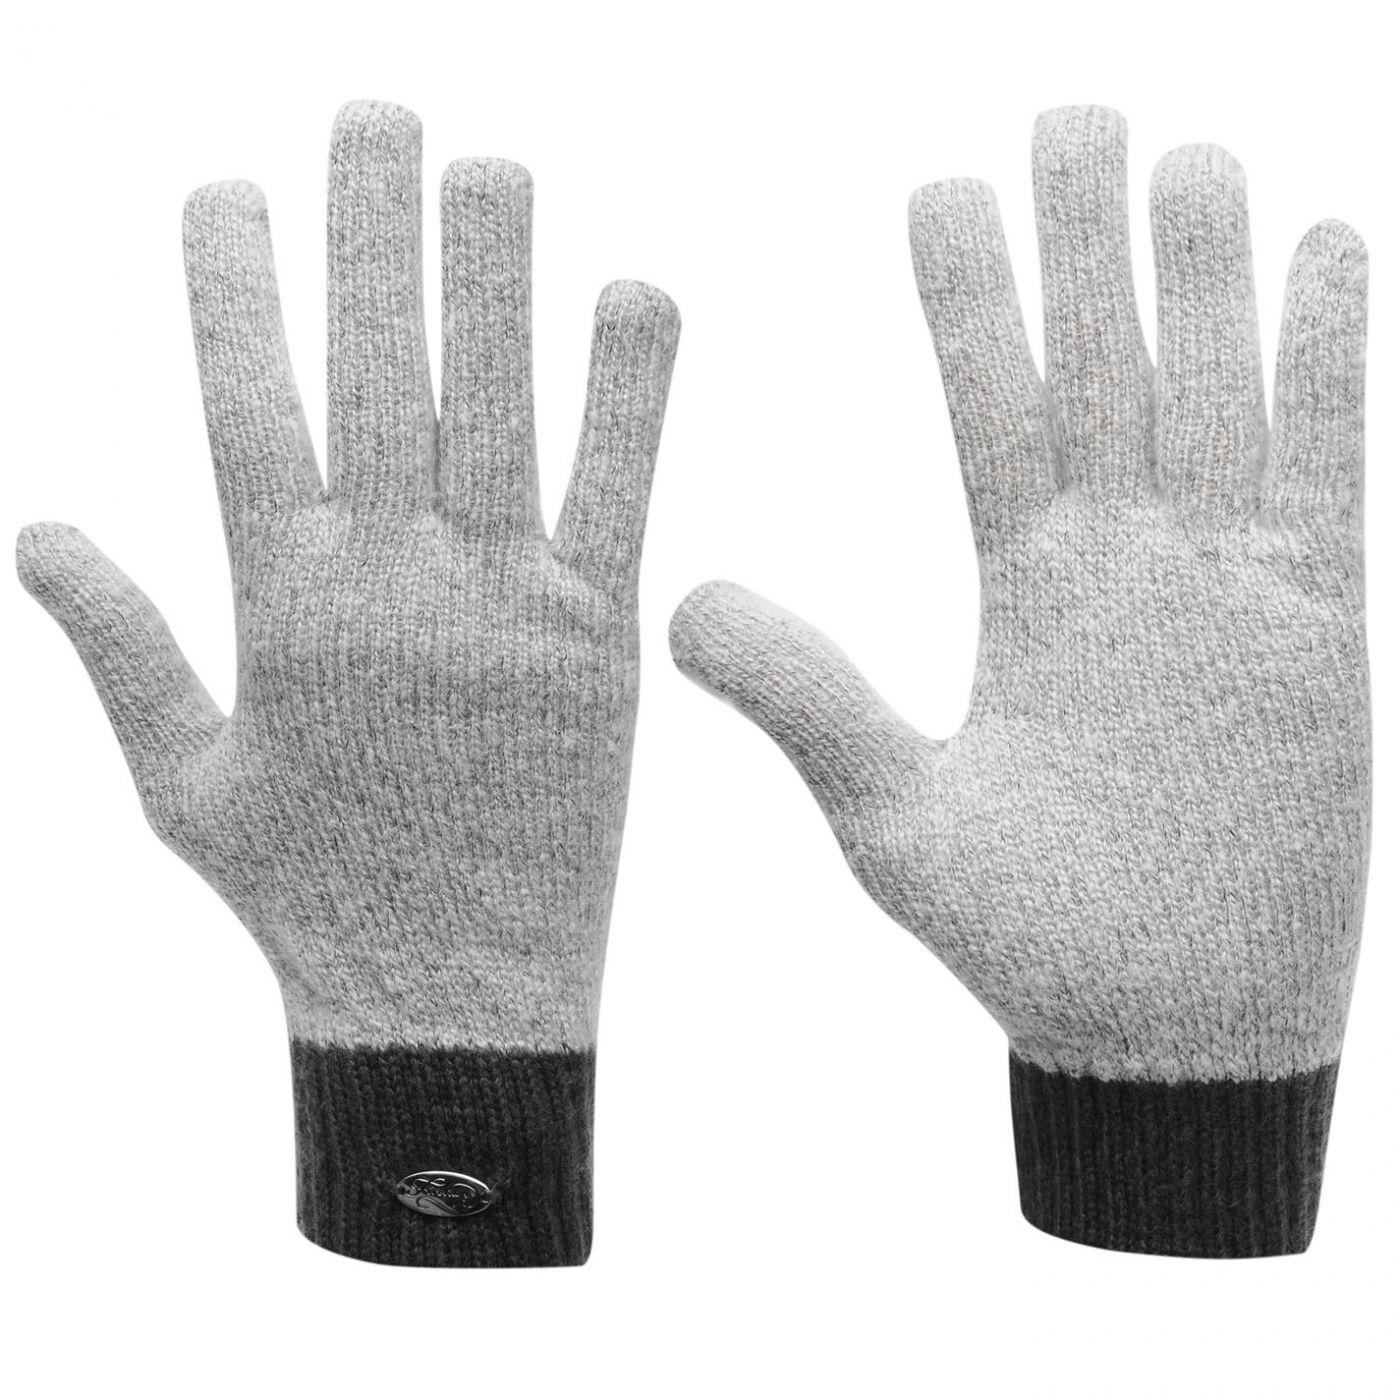 Firetrap Healy Gloves Ladies